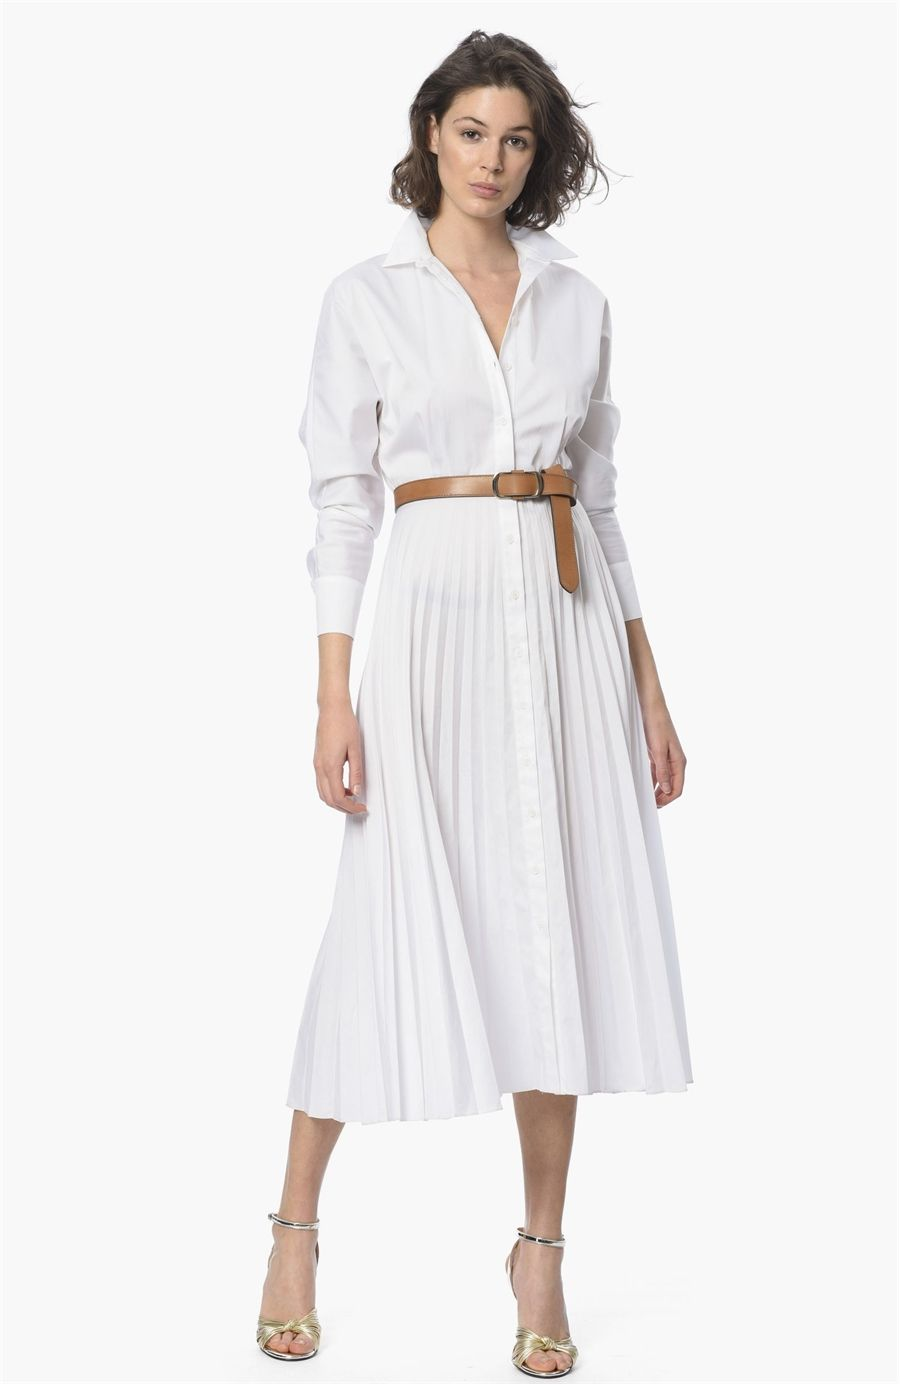 Derin Mermerci X Network Beyaz Elbise Renk Beyaz Network Elbise Moda Stilleri Elbise Modelleri